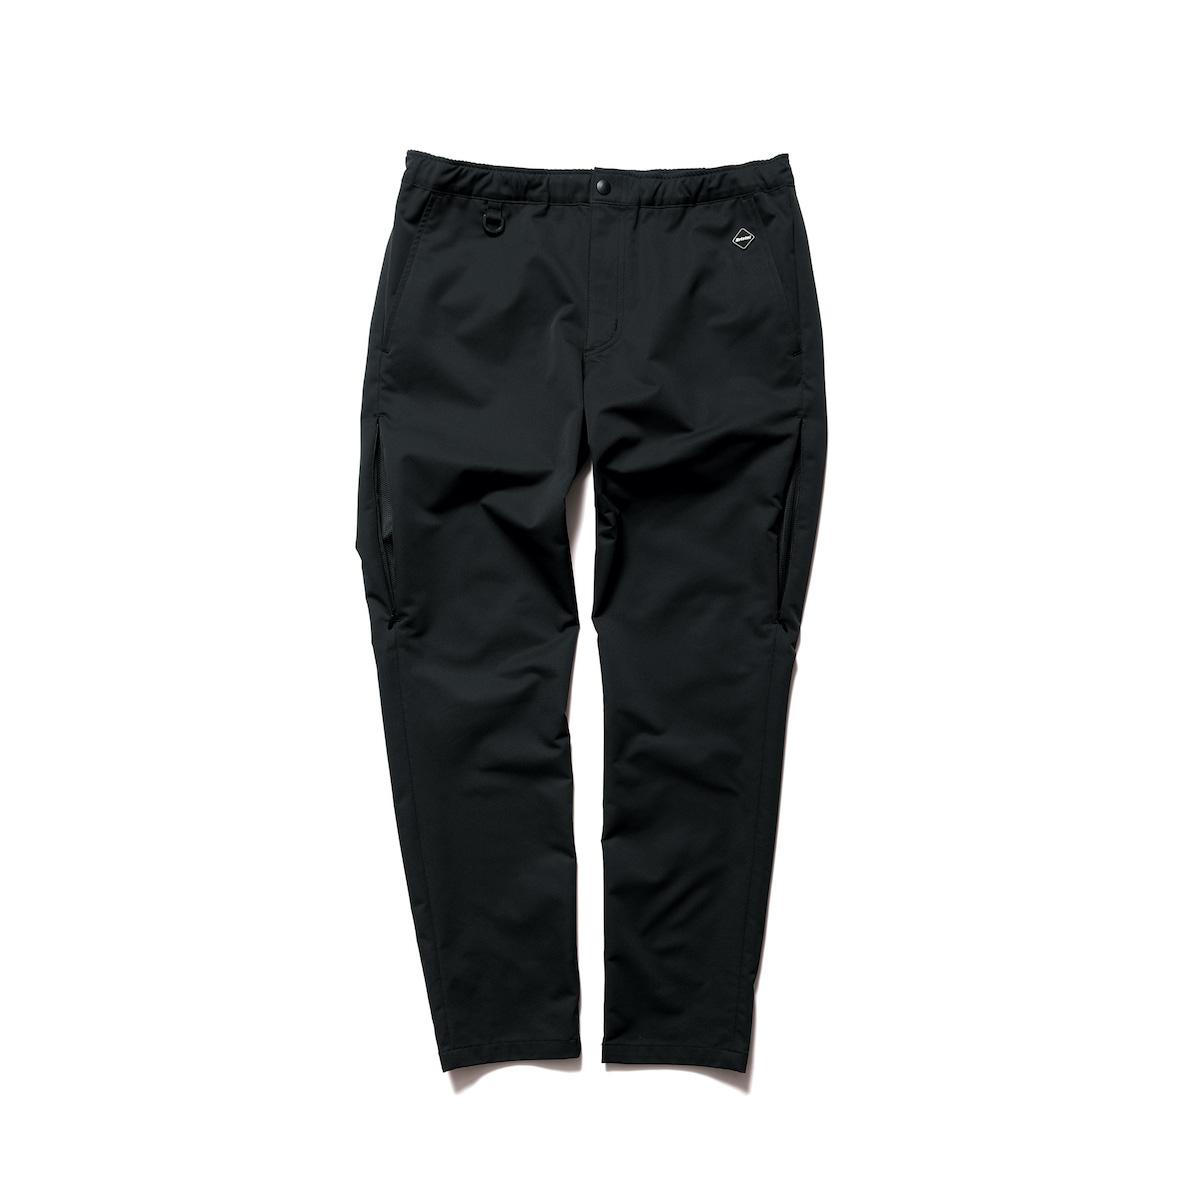 F.C.Real Bristol / VENTILATION CHINO PANTS (Black)